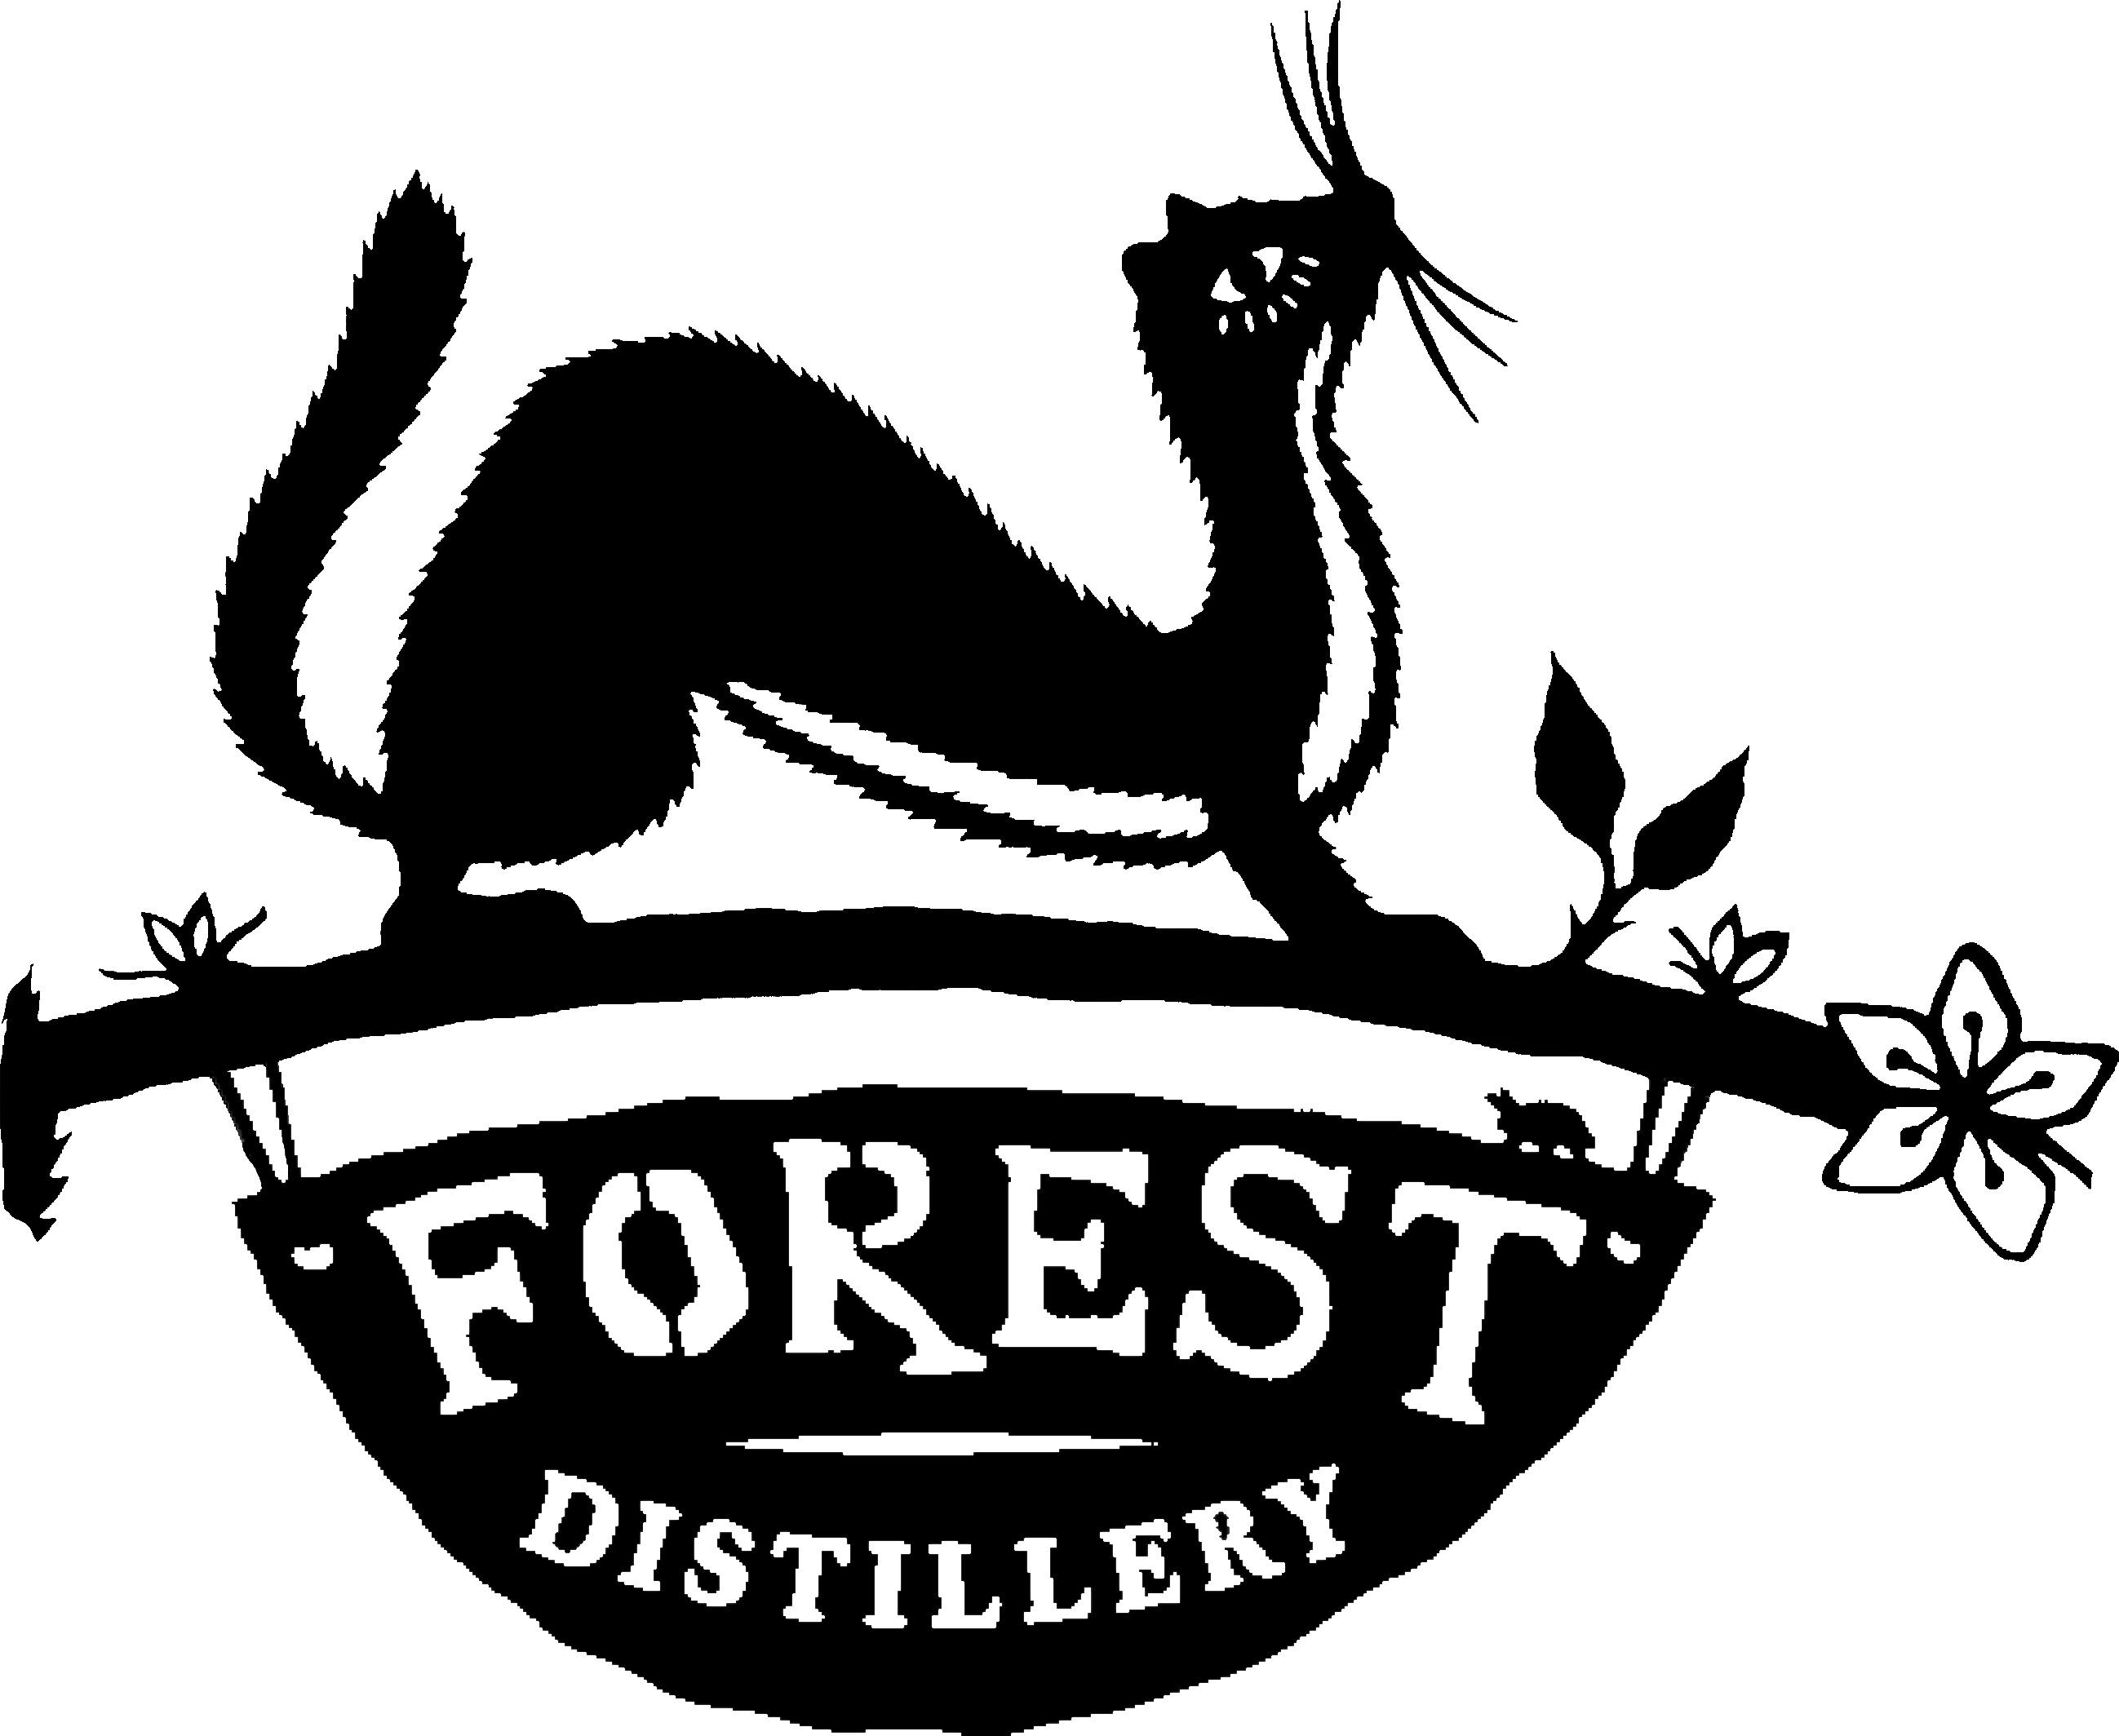 Forest Distillery Ltd